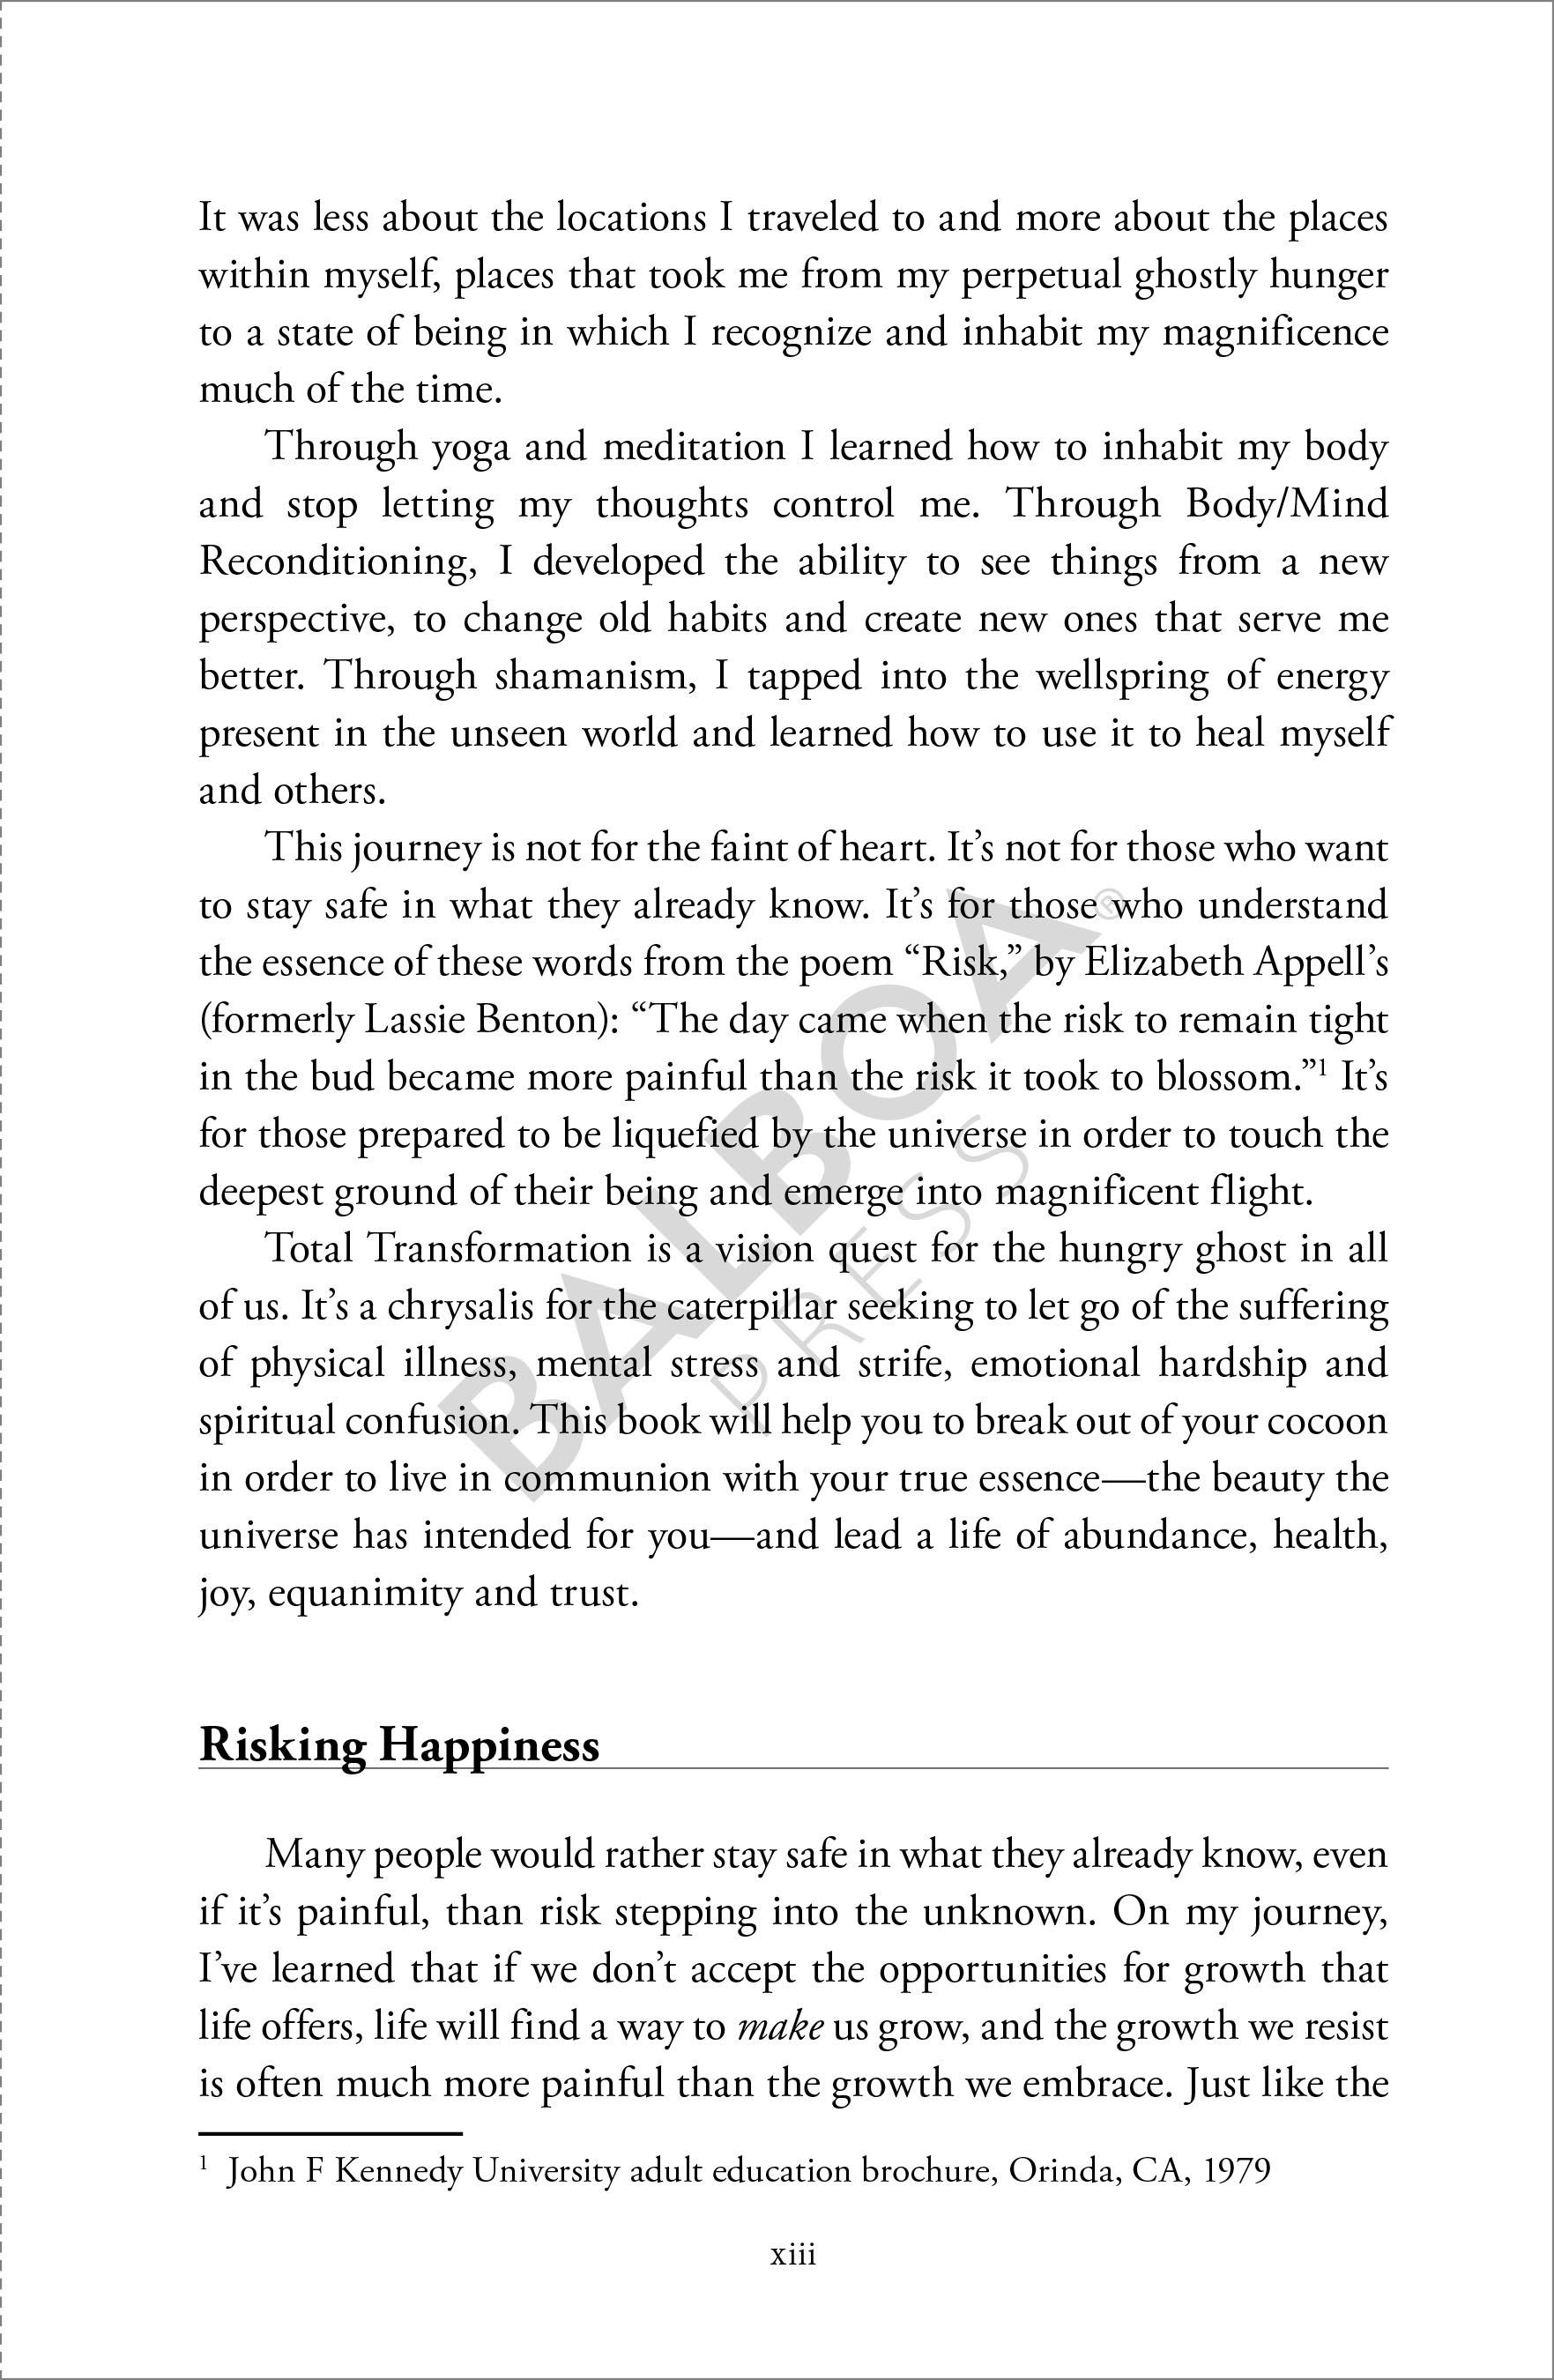 Sample book 11.jpg